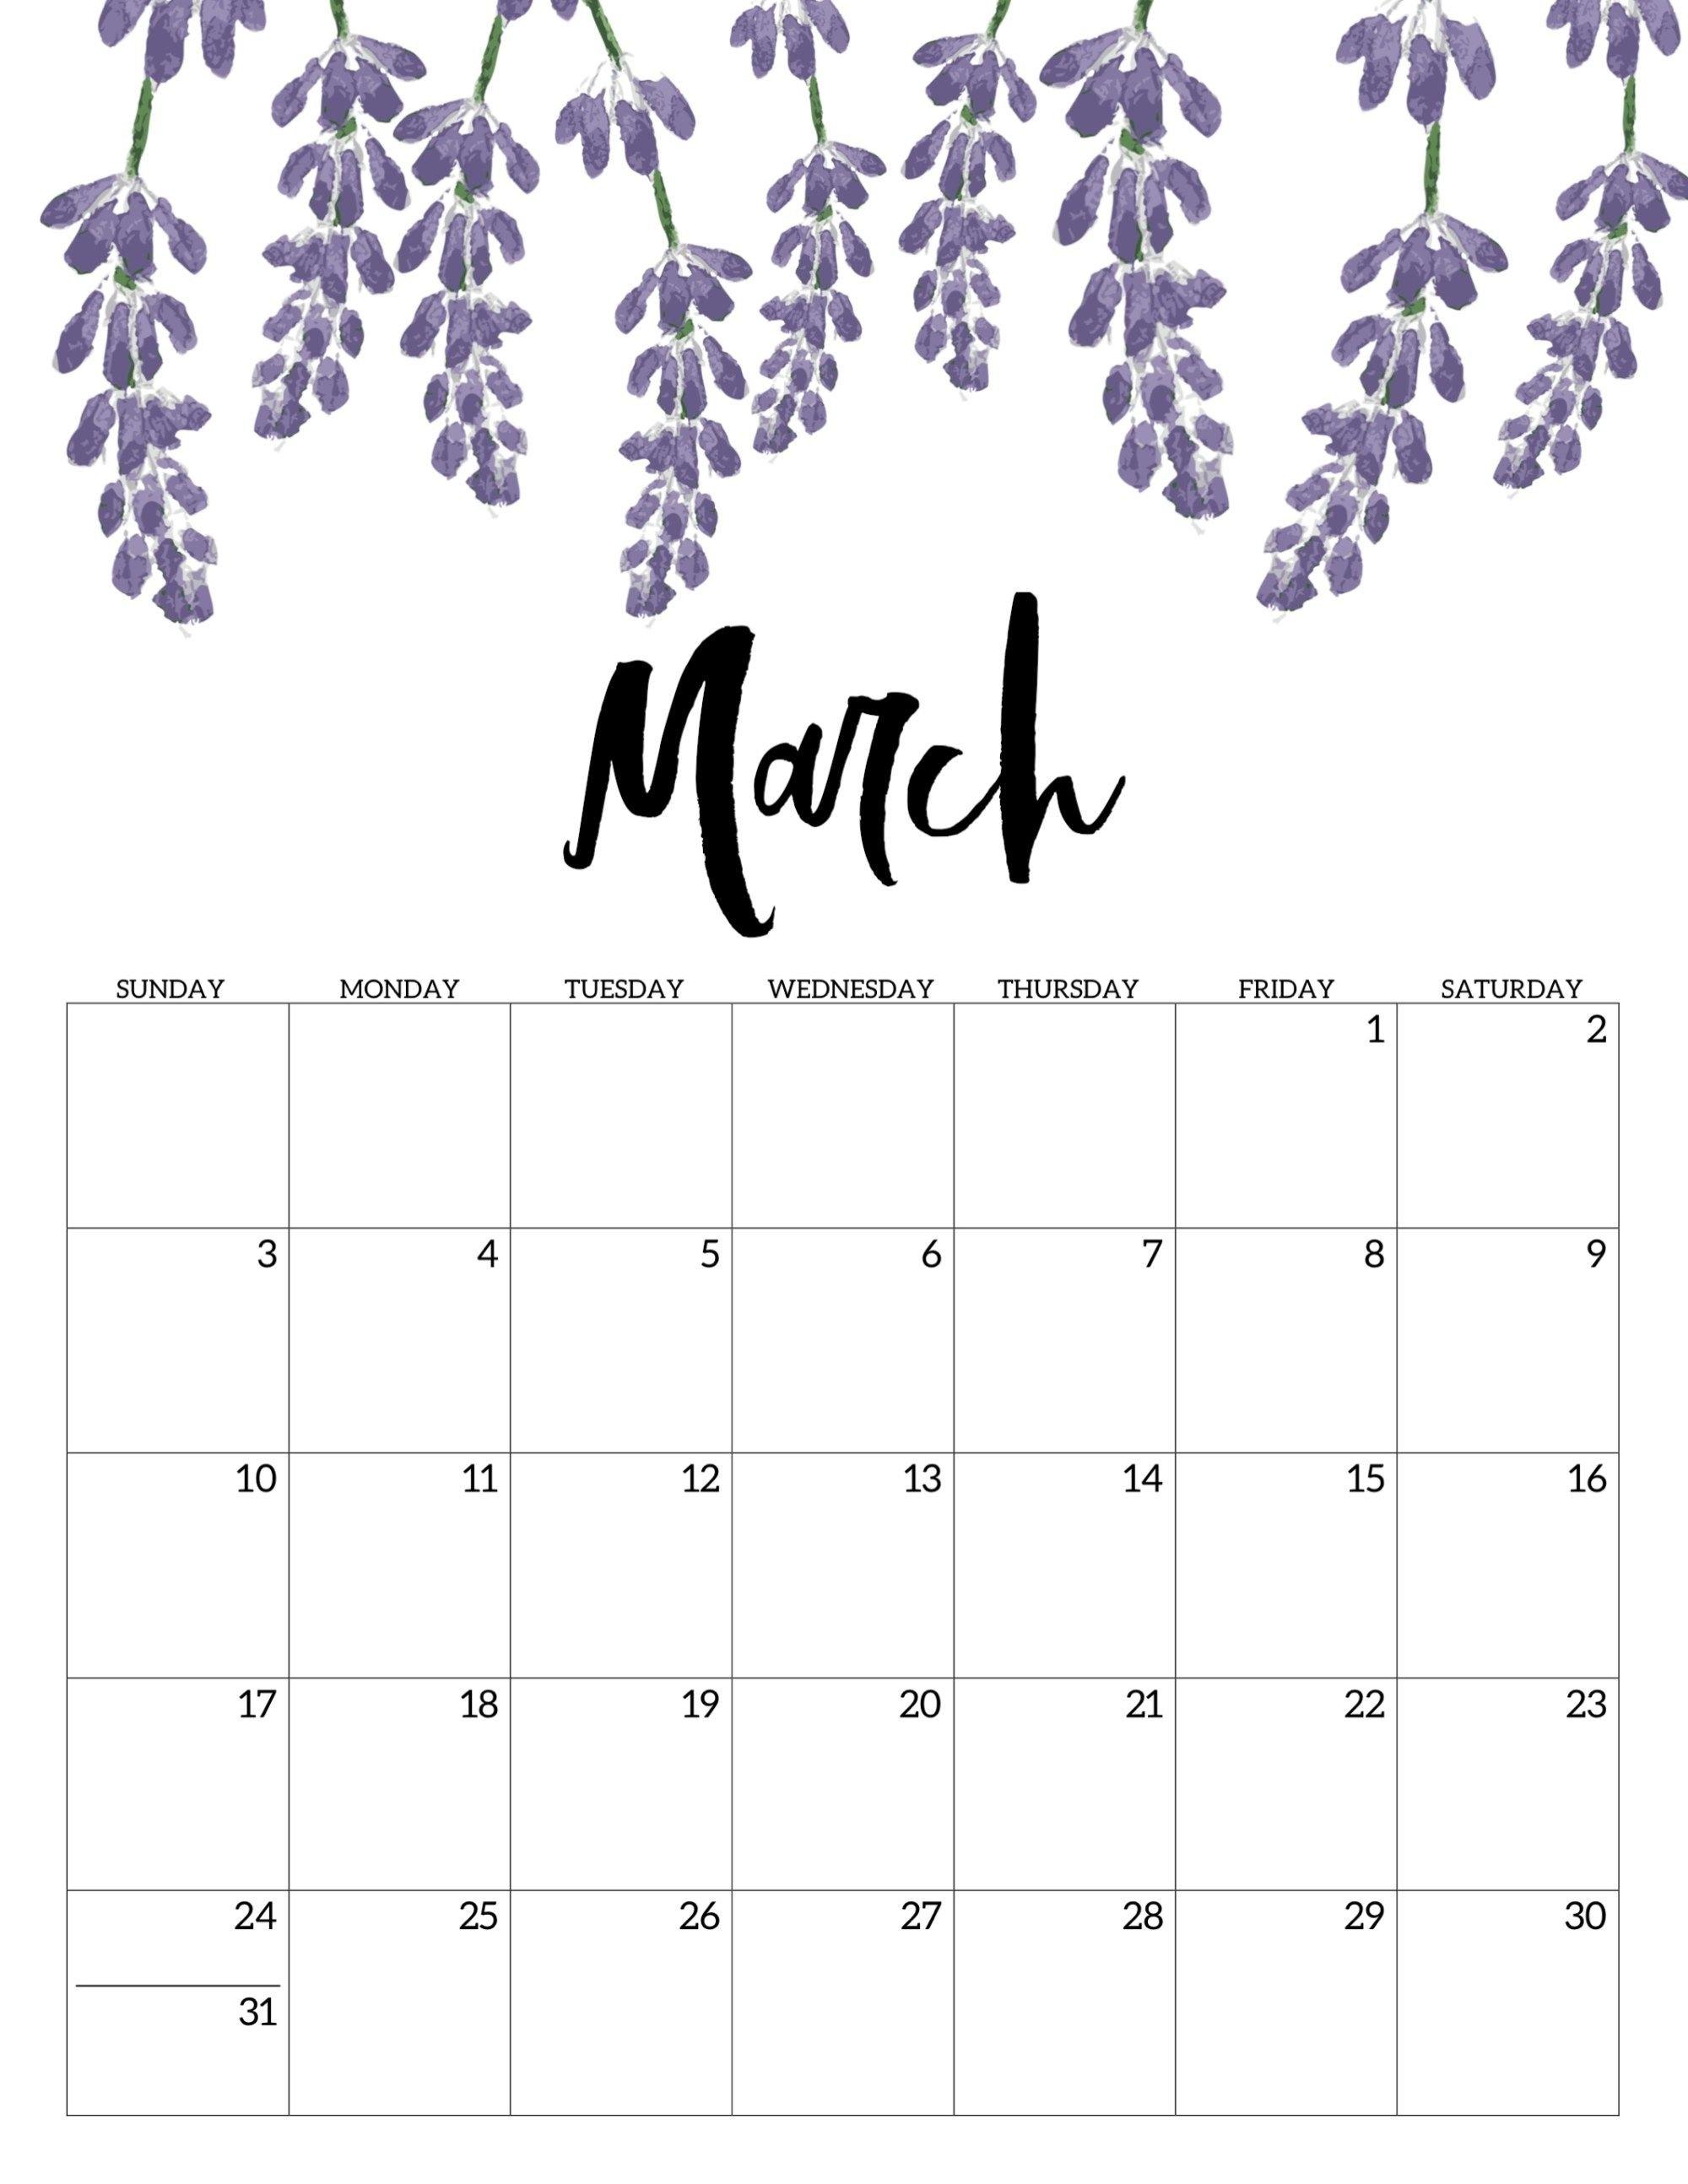 Free Printable Calendar 2019 - Floral | Calendar | Calendar, Free Calendar 2019 Print Free